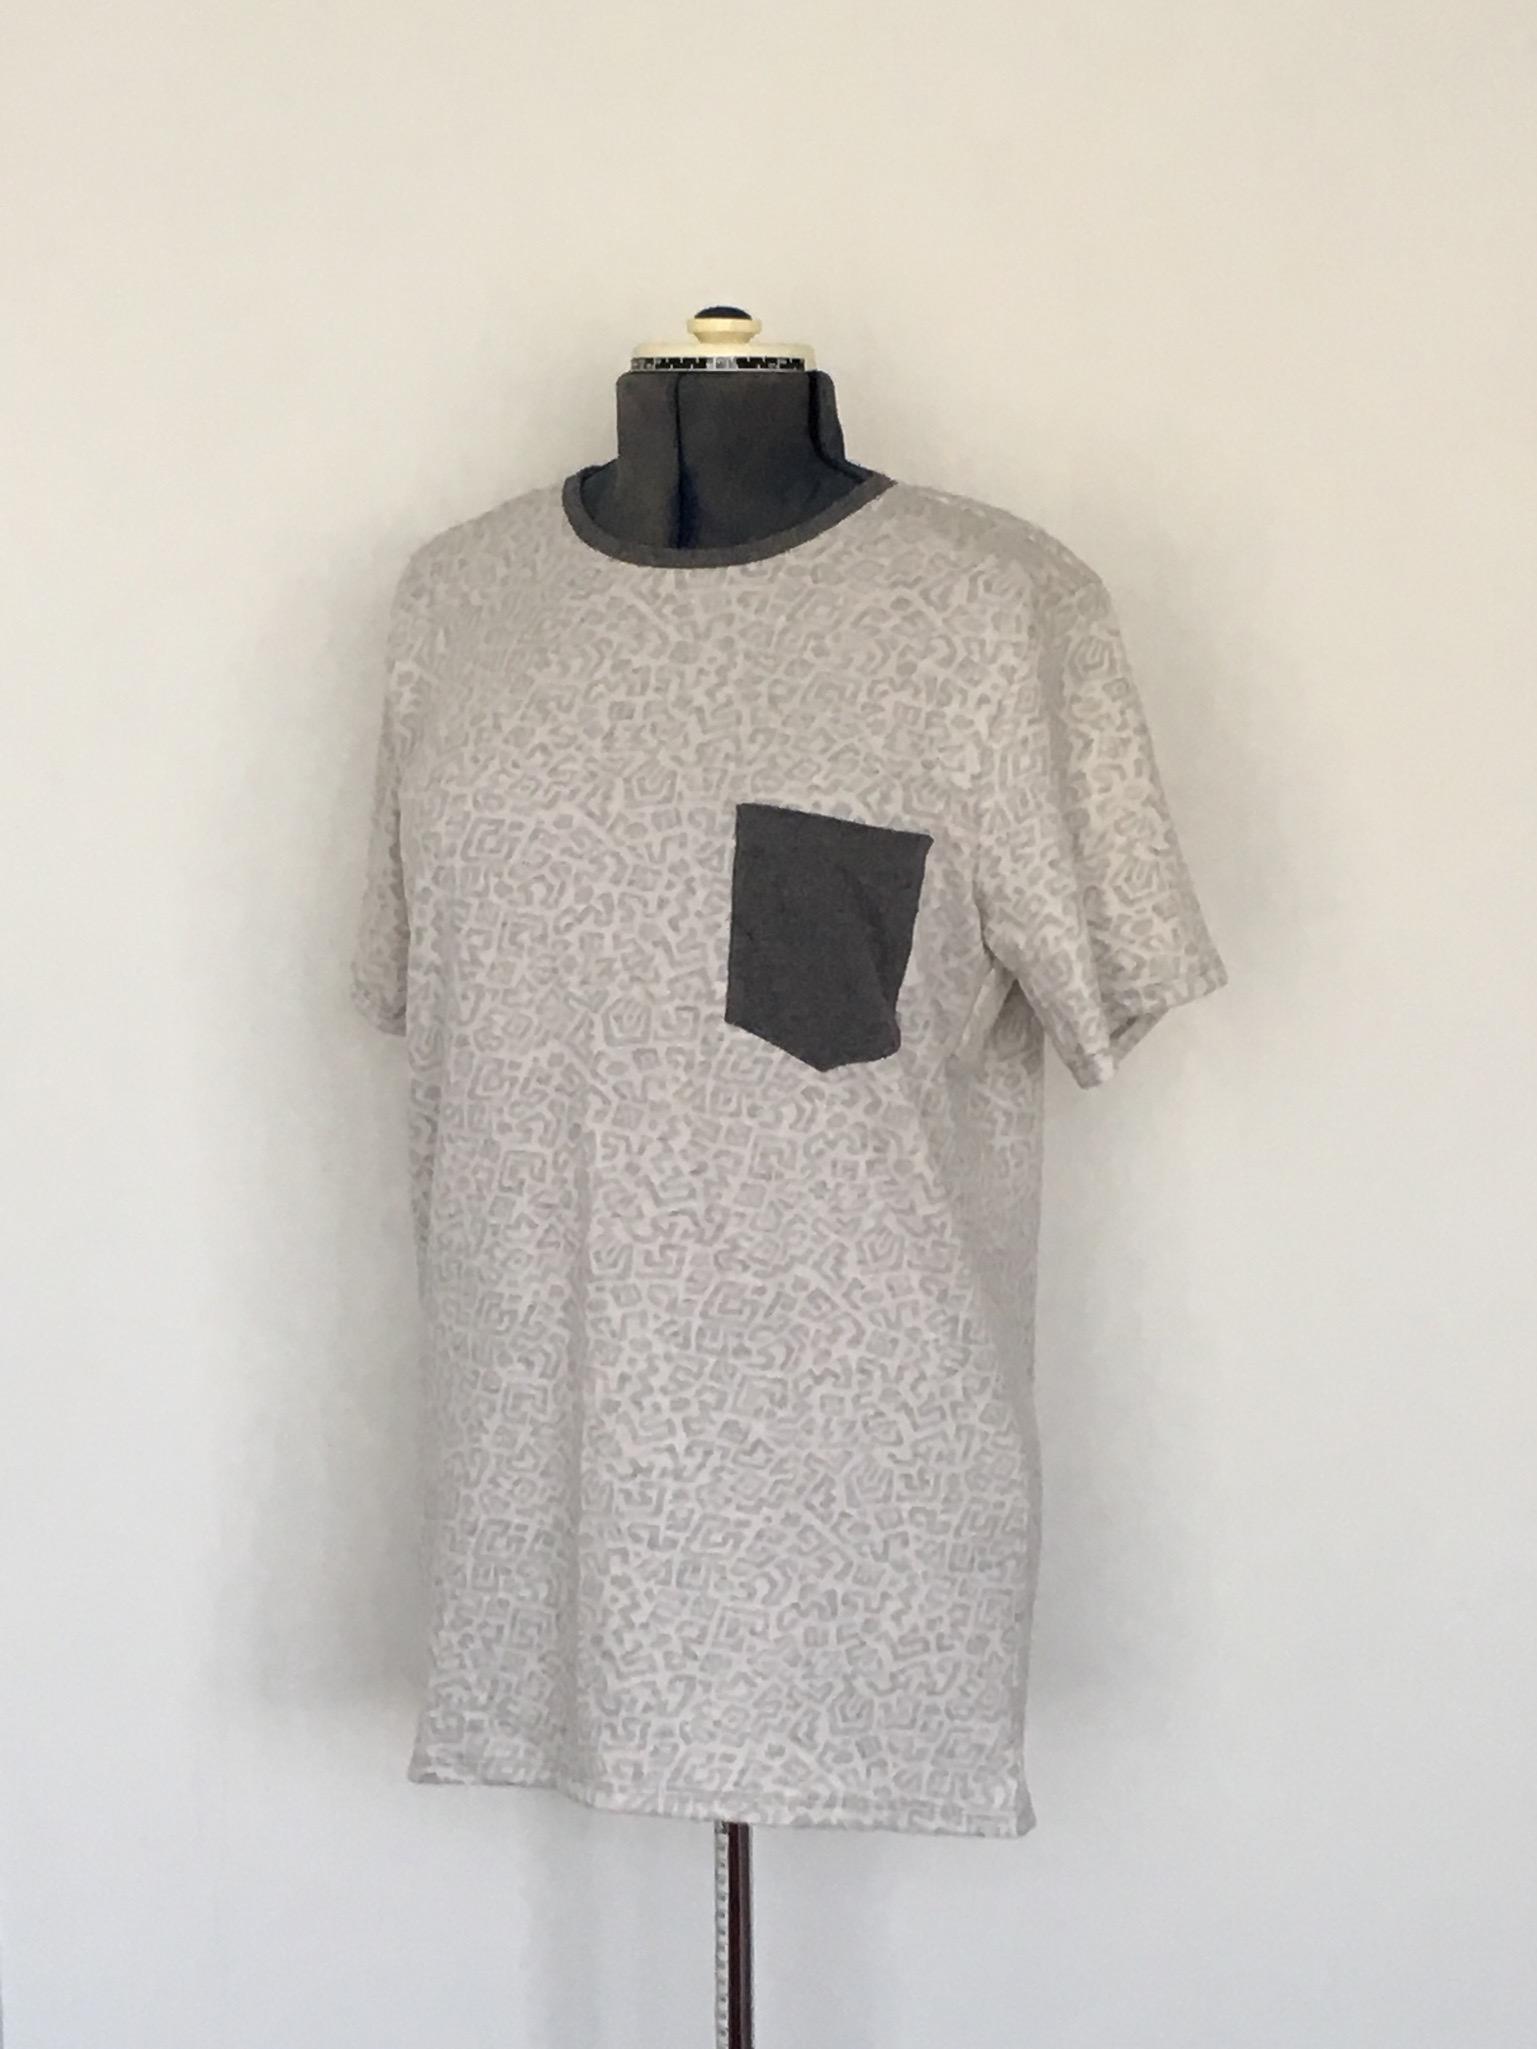 Grey White graphic design Leisure wear male T-shirt